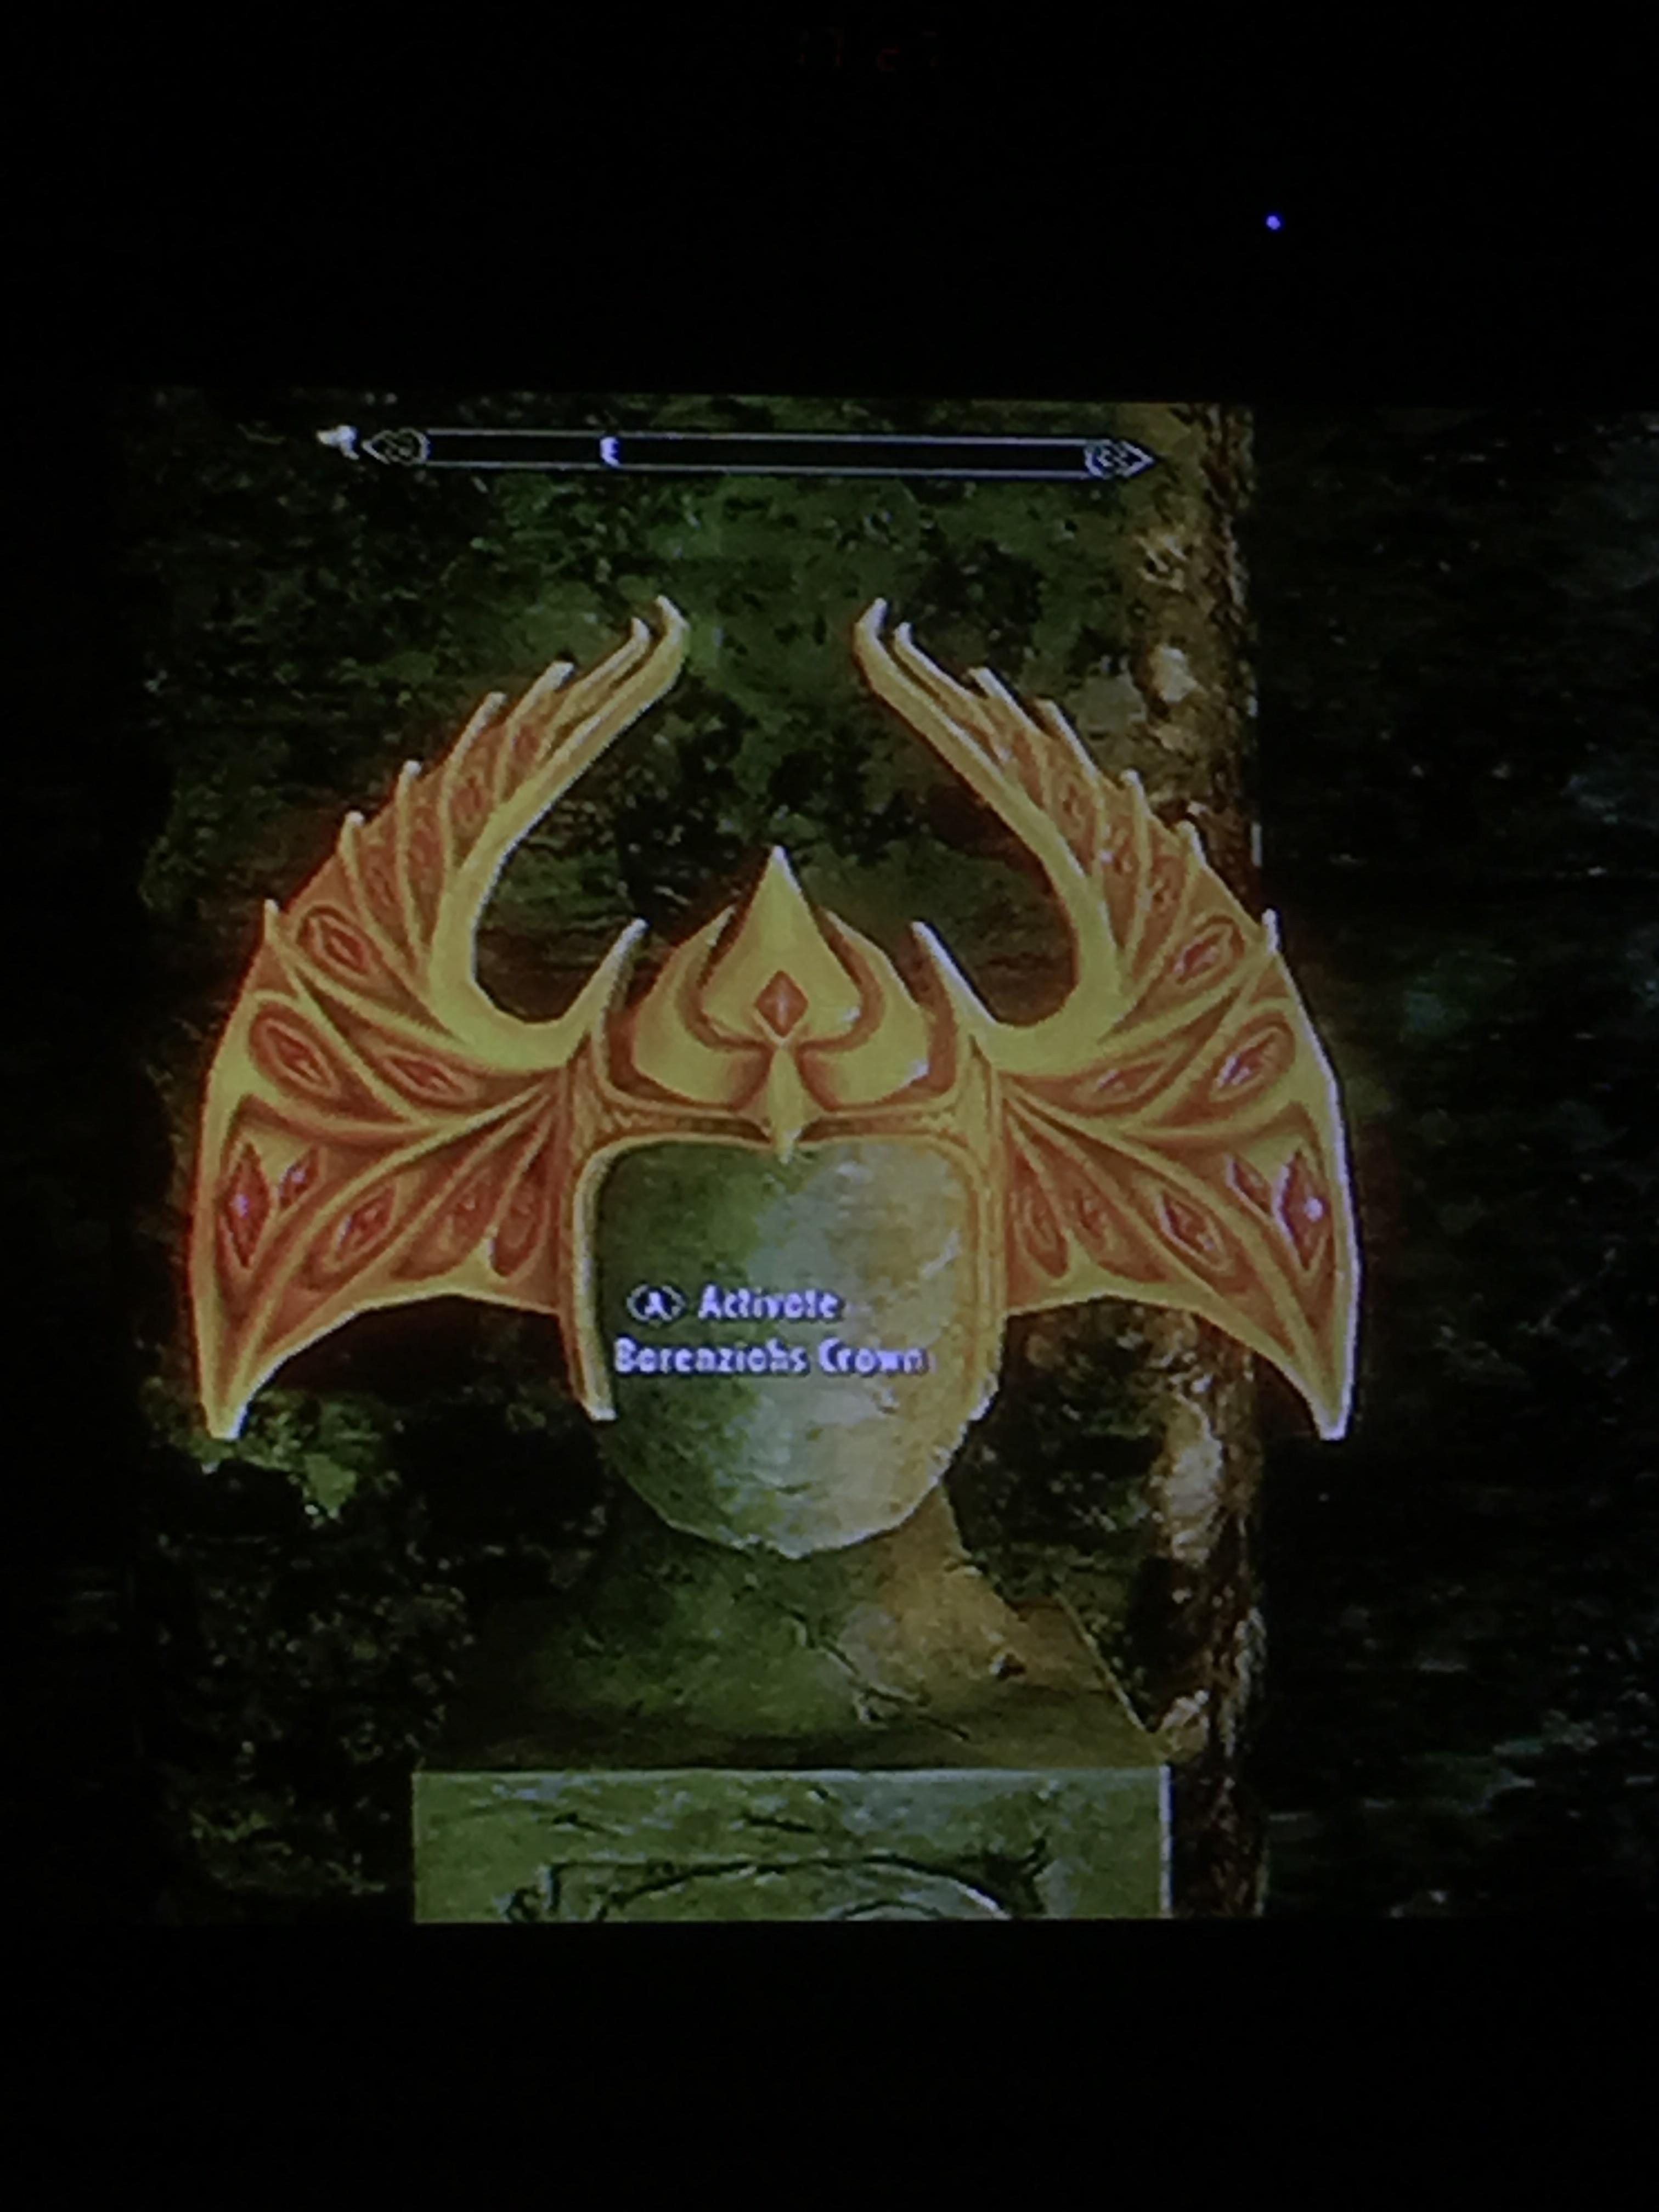 Stones Of Barenziah Quest : stones, barenziah, quest, Doing, Barenziah, Quest, Easier, Imagine, Yourself, Thanos, Stones, Infinity, Skyrim